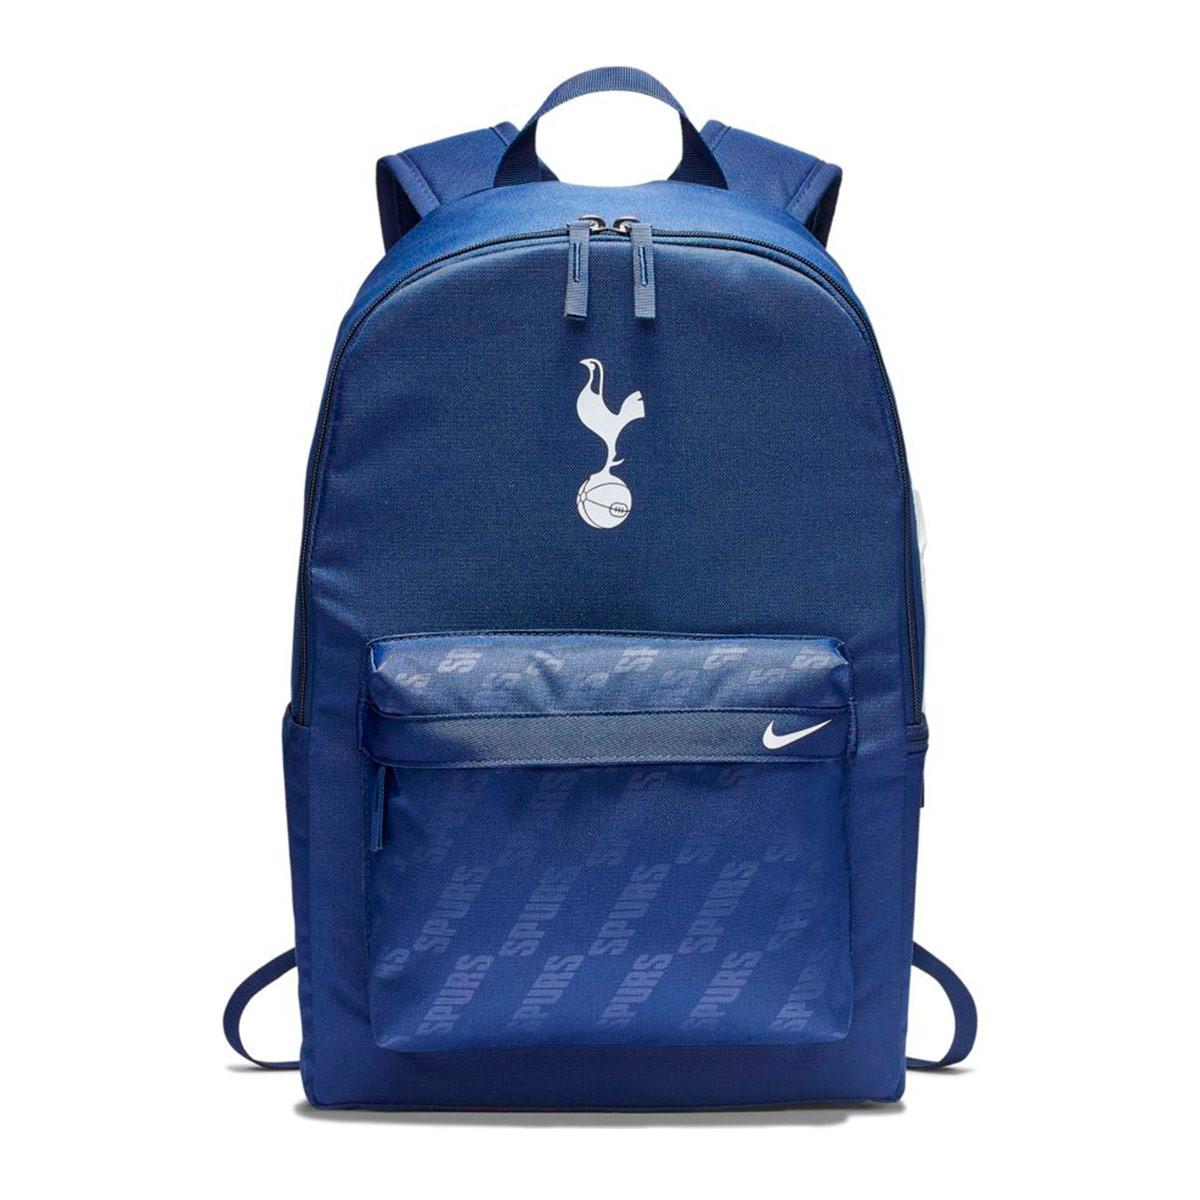 Hotspur 2019 Mochila White Tottenham Binary 2020 Blue WDH9IEY2e